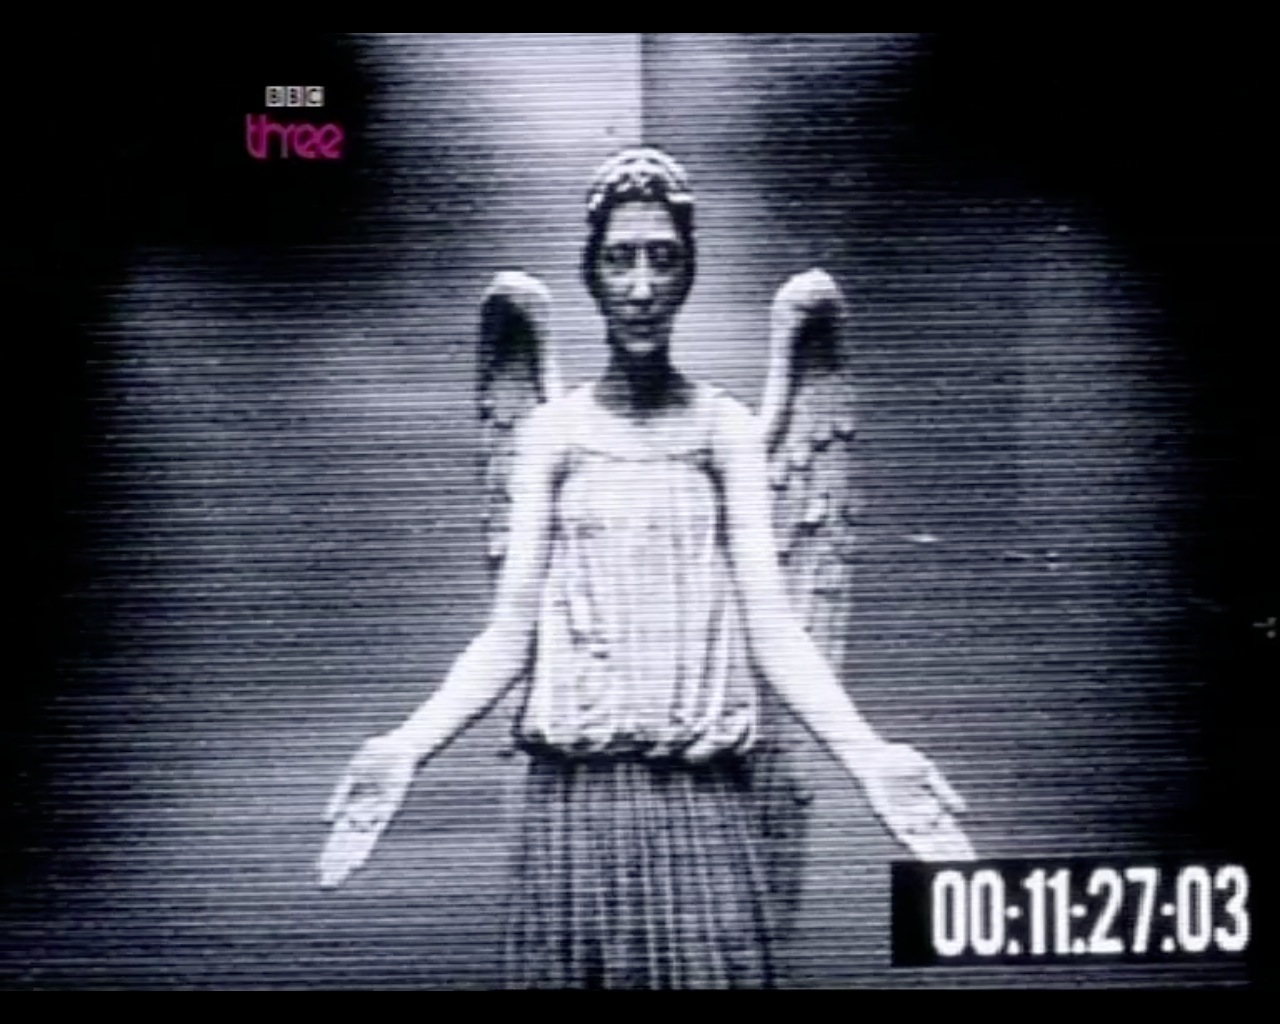 weeping angels wallpaper hd